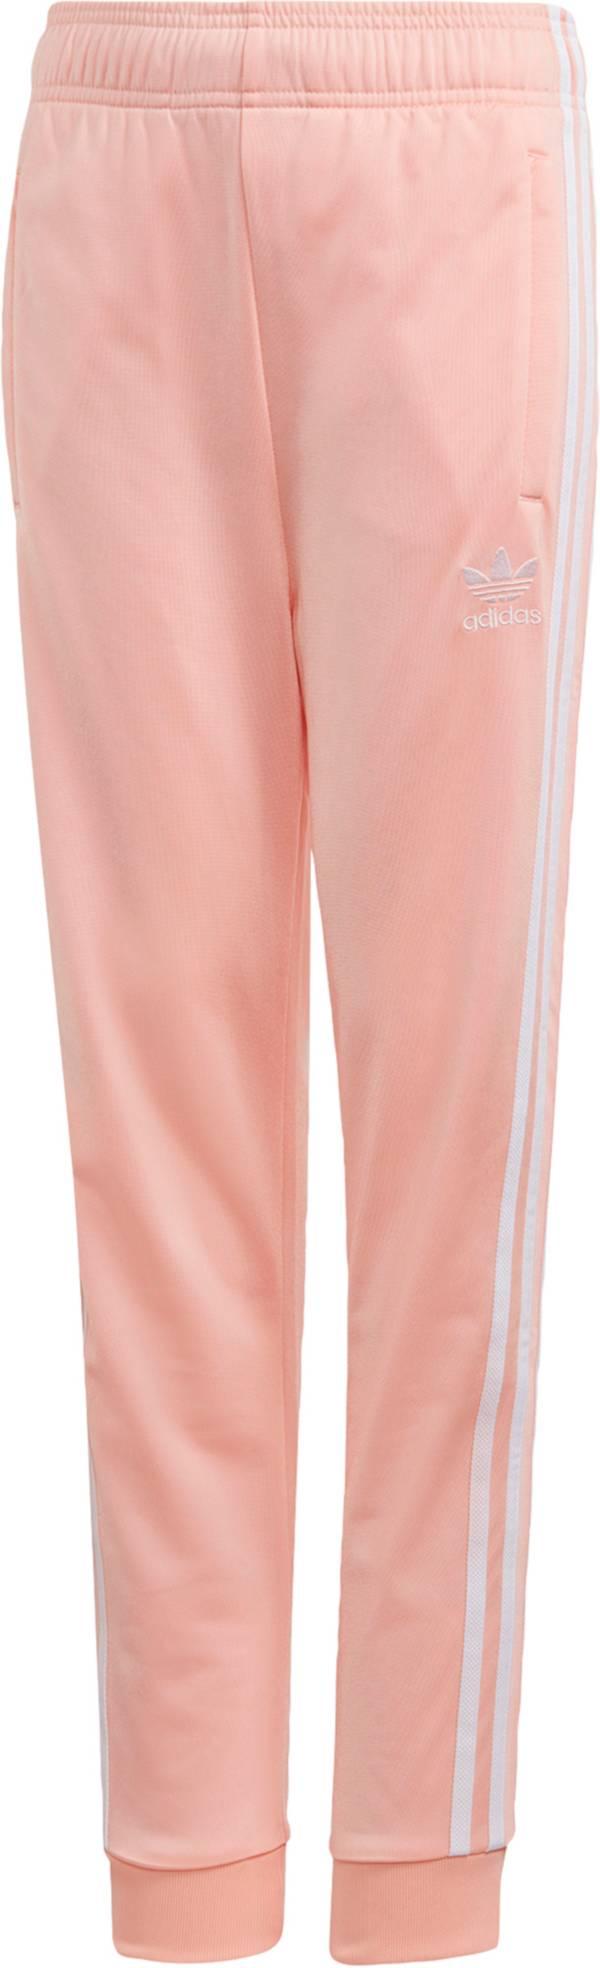 adidas Girls' Originals SST Track Pants product image